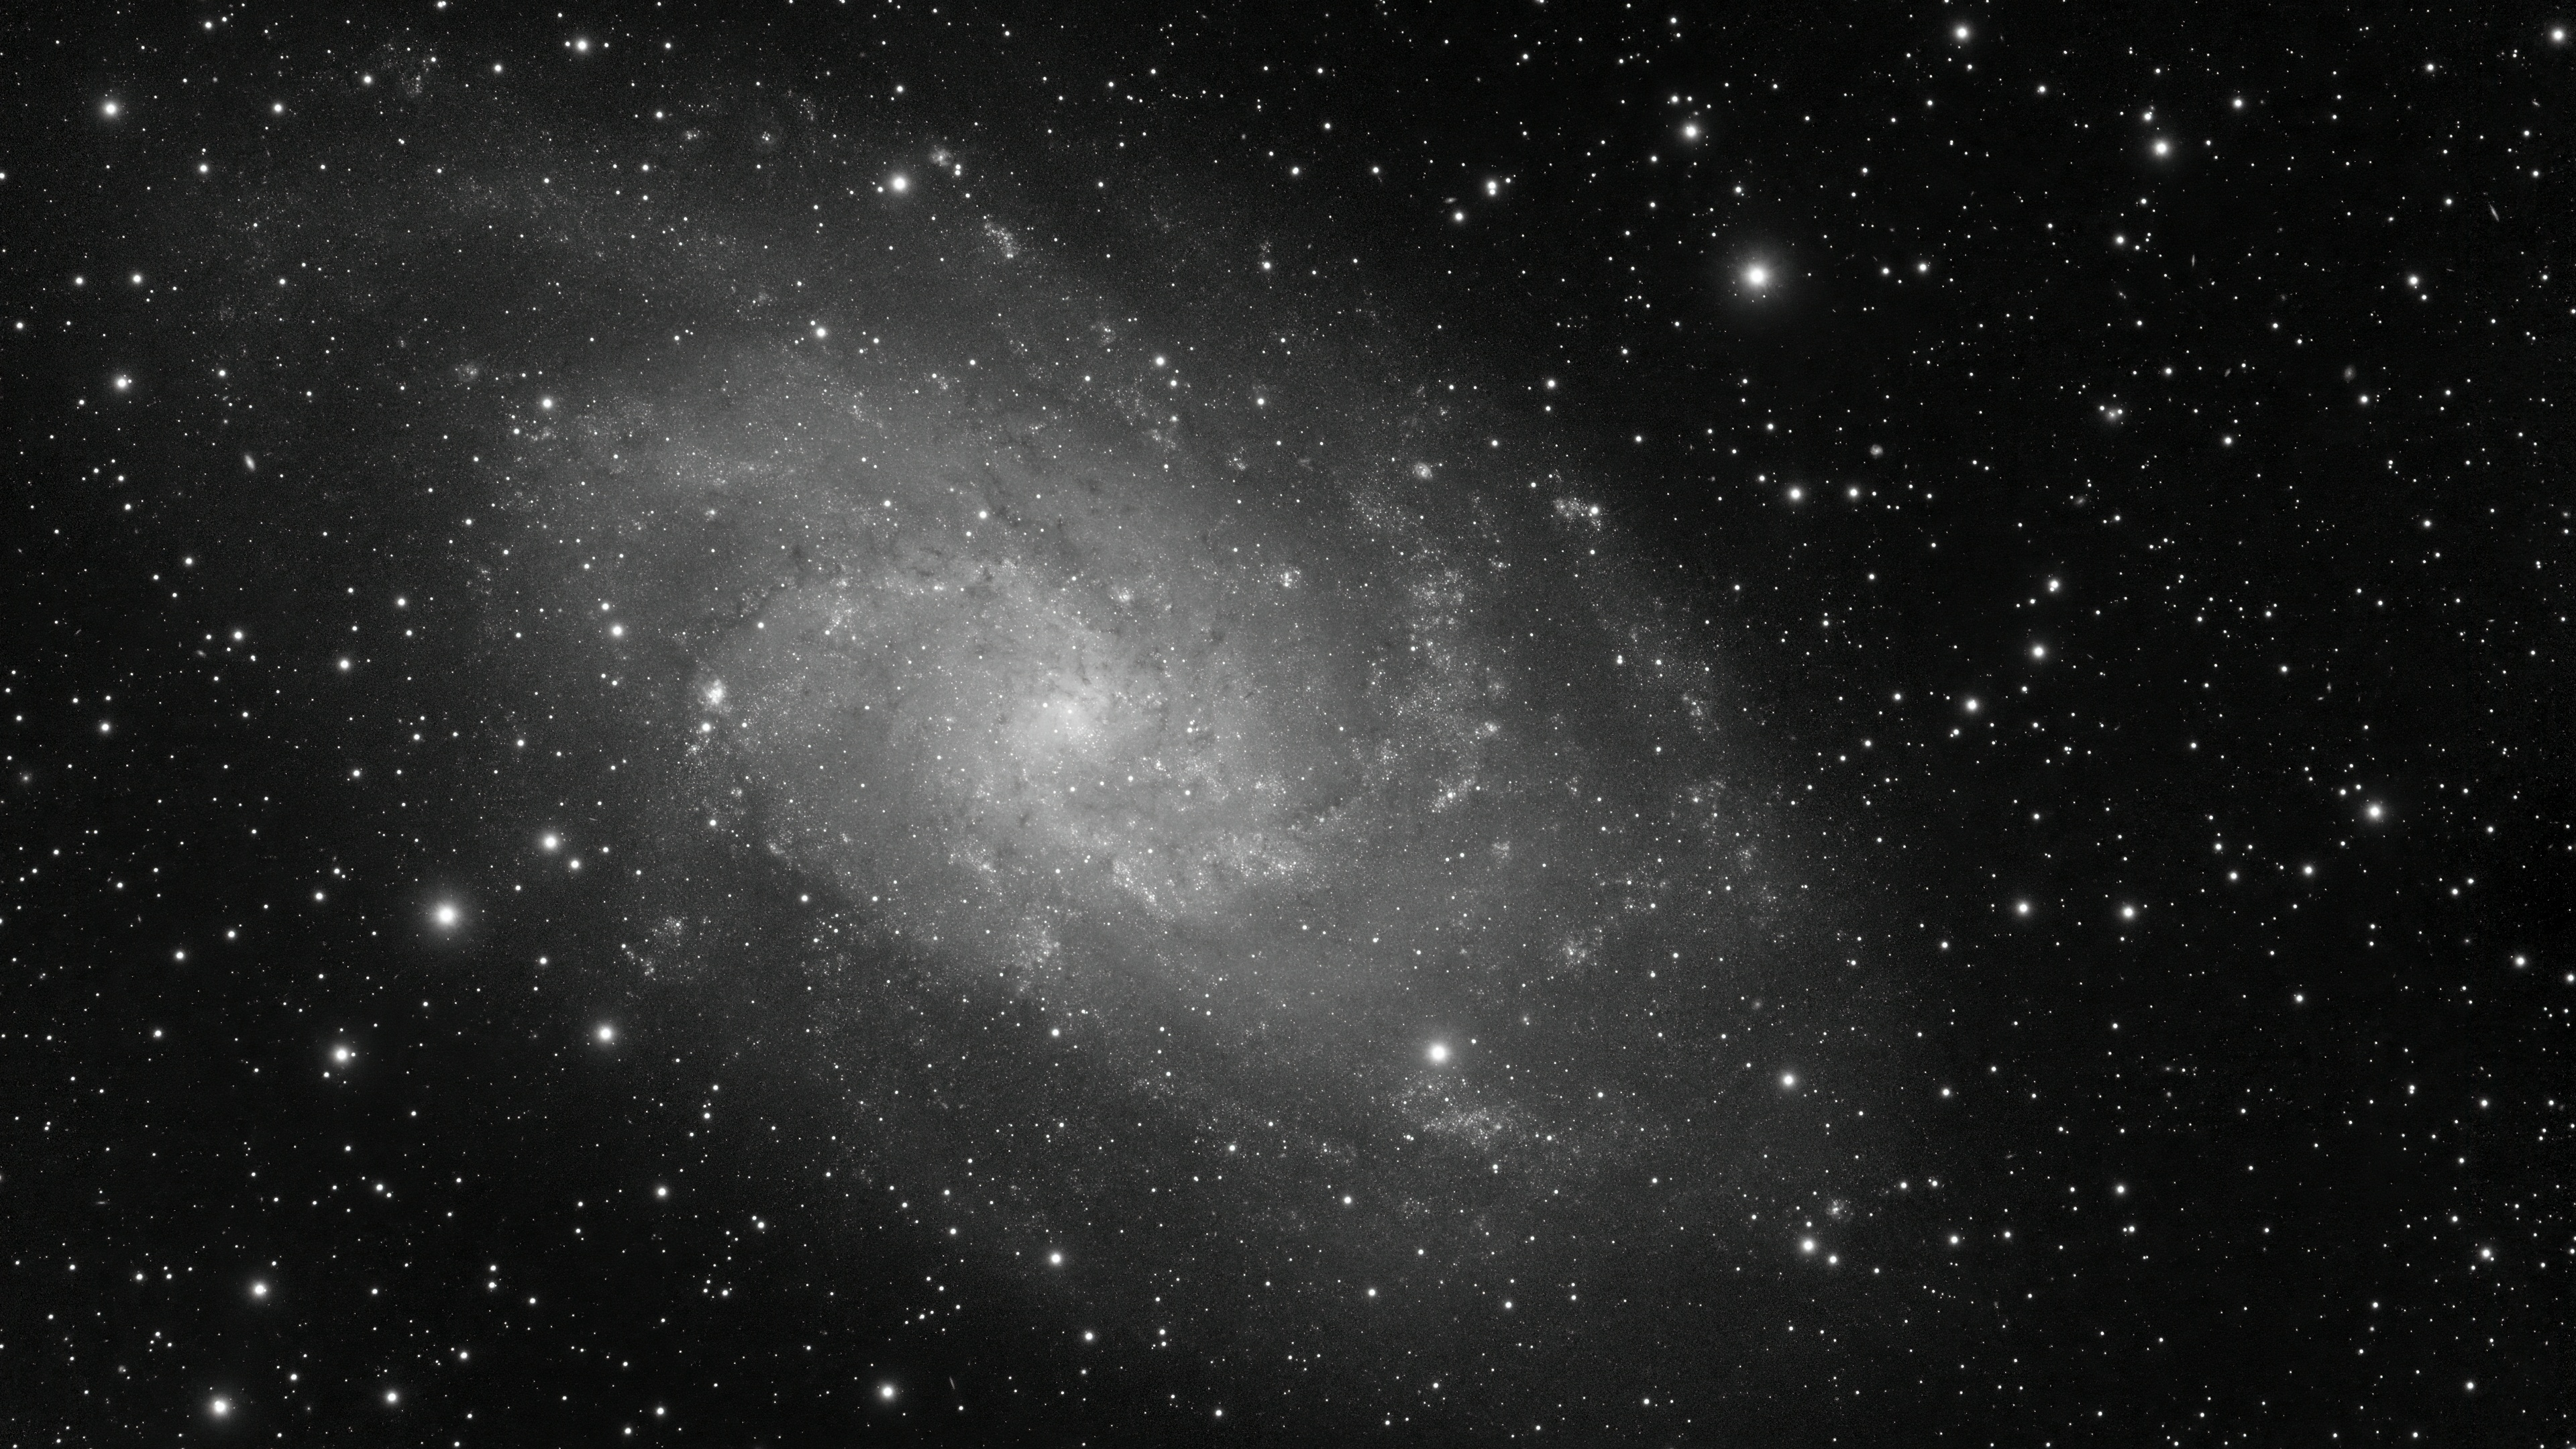 M33-26x180s-L-G111_denoise.jpg